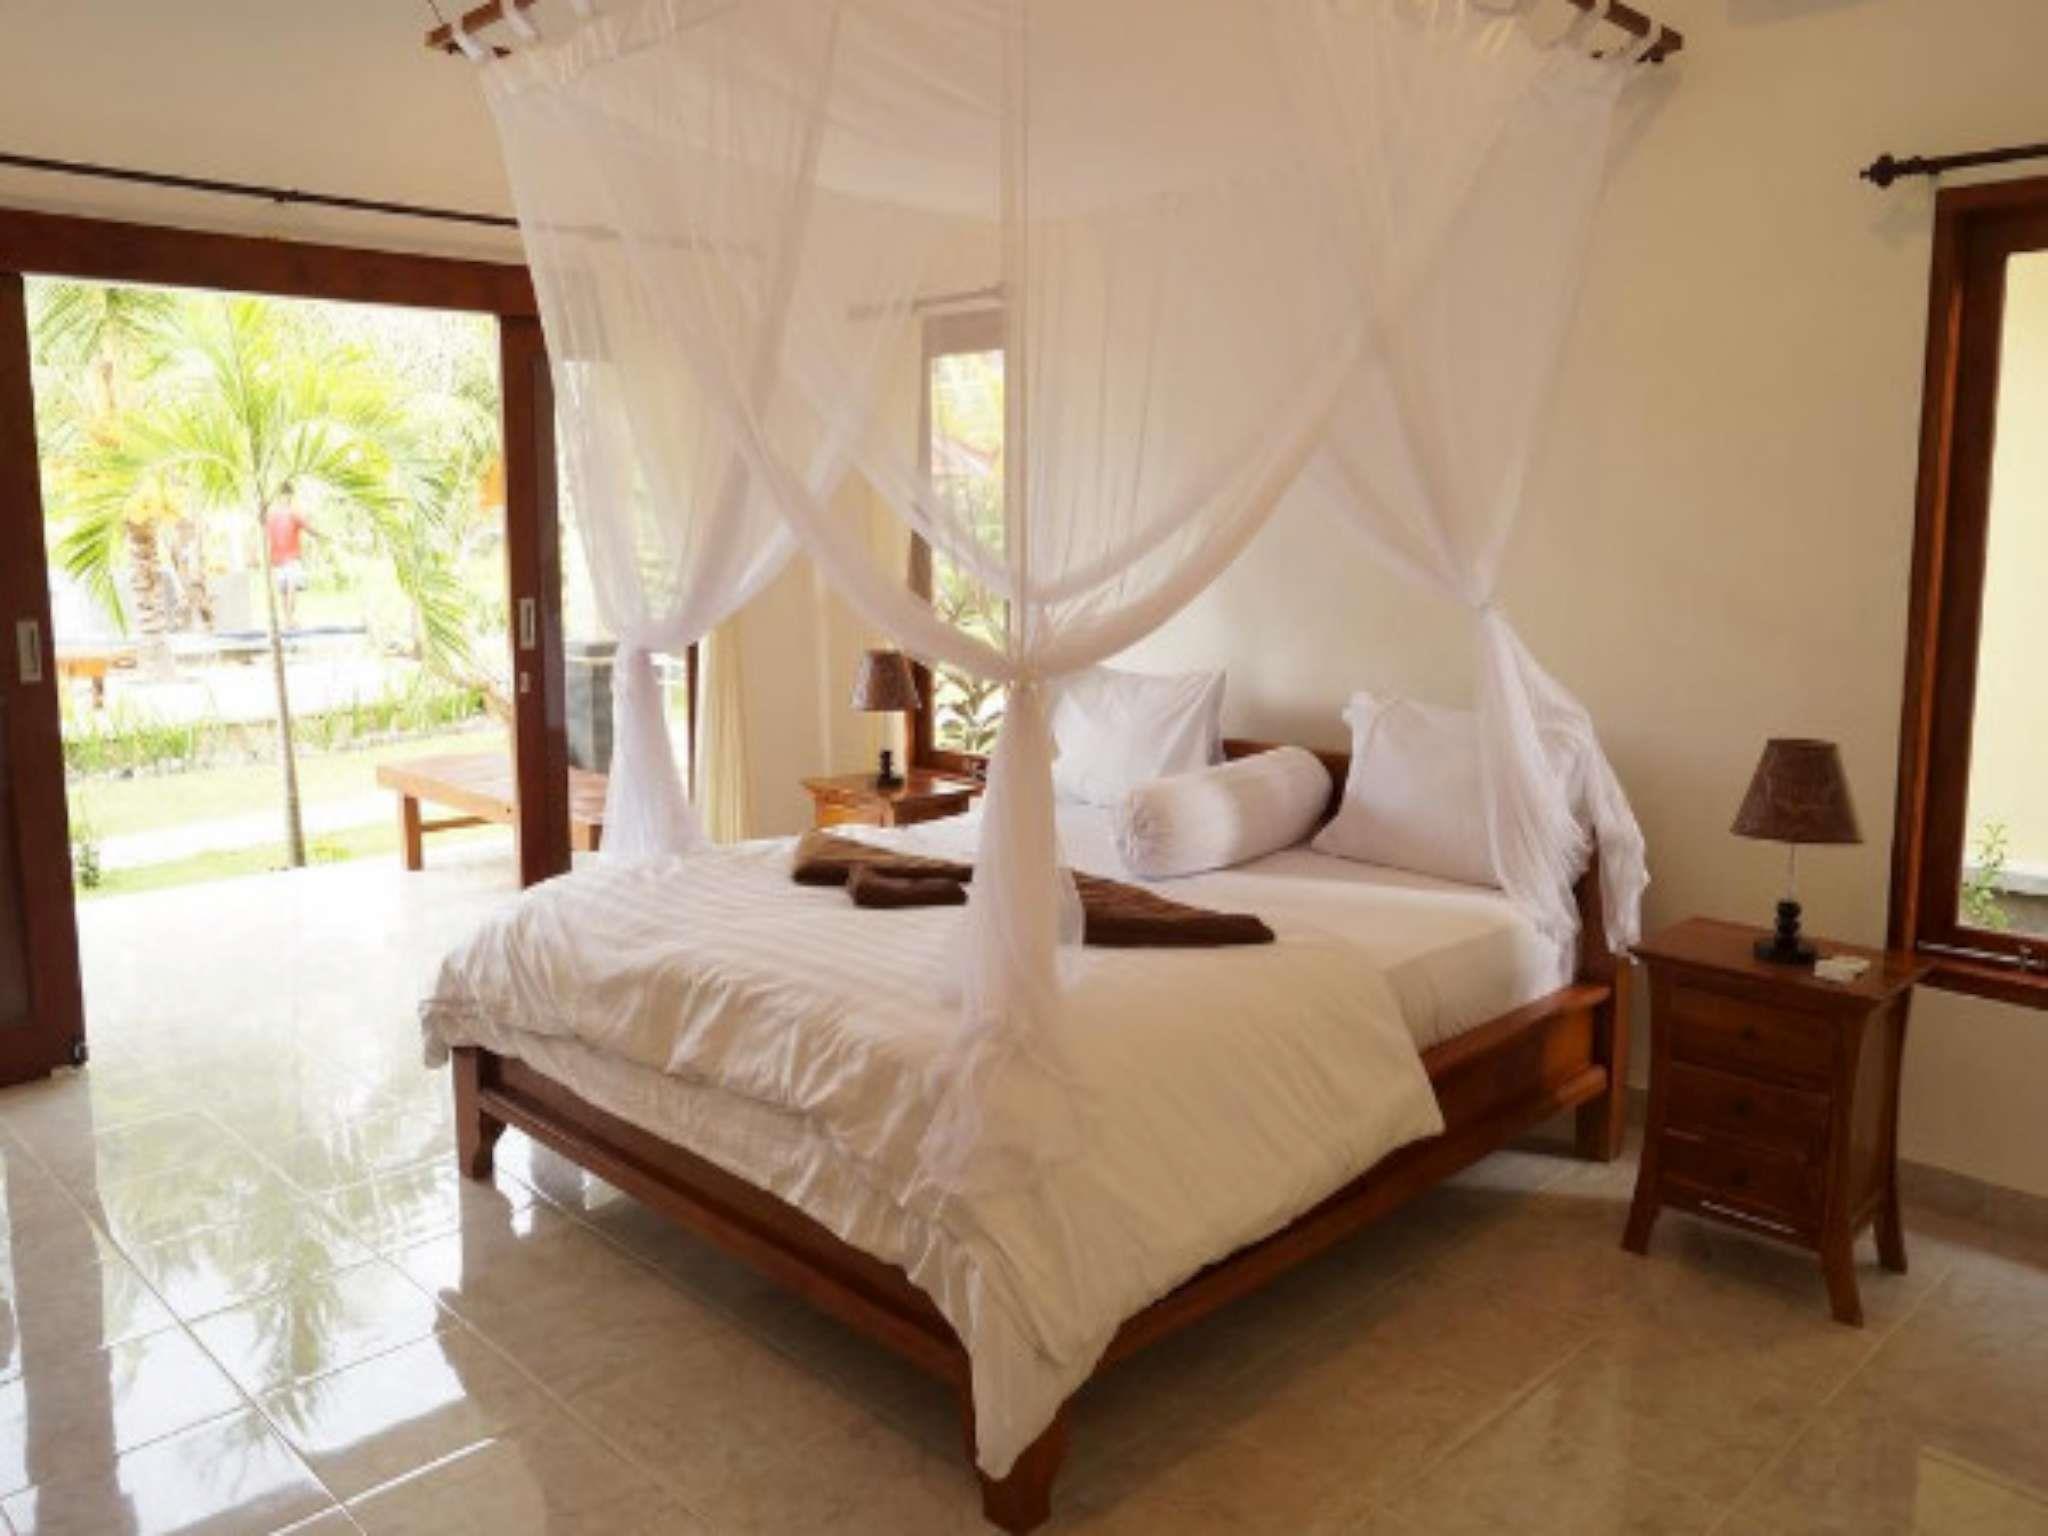 2BR Apartment Unit 3 at Mangga Villa Beach ホテル詳細